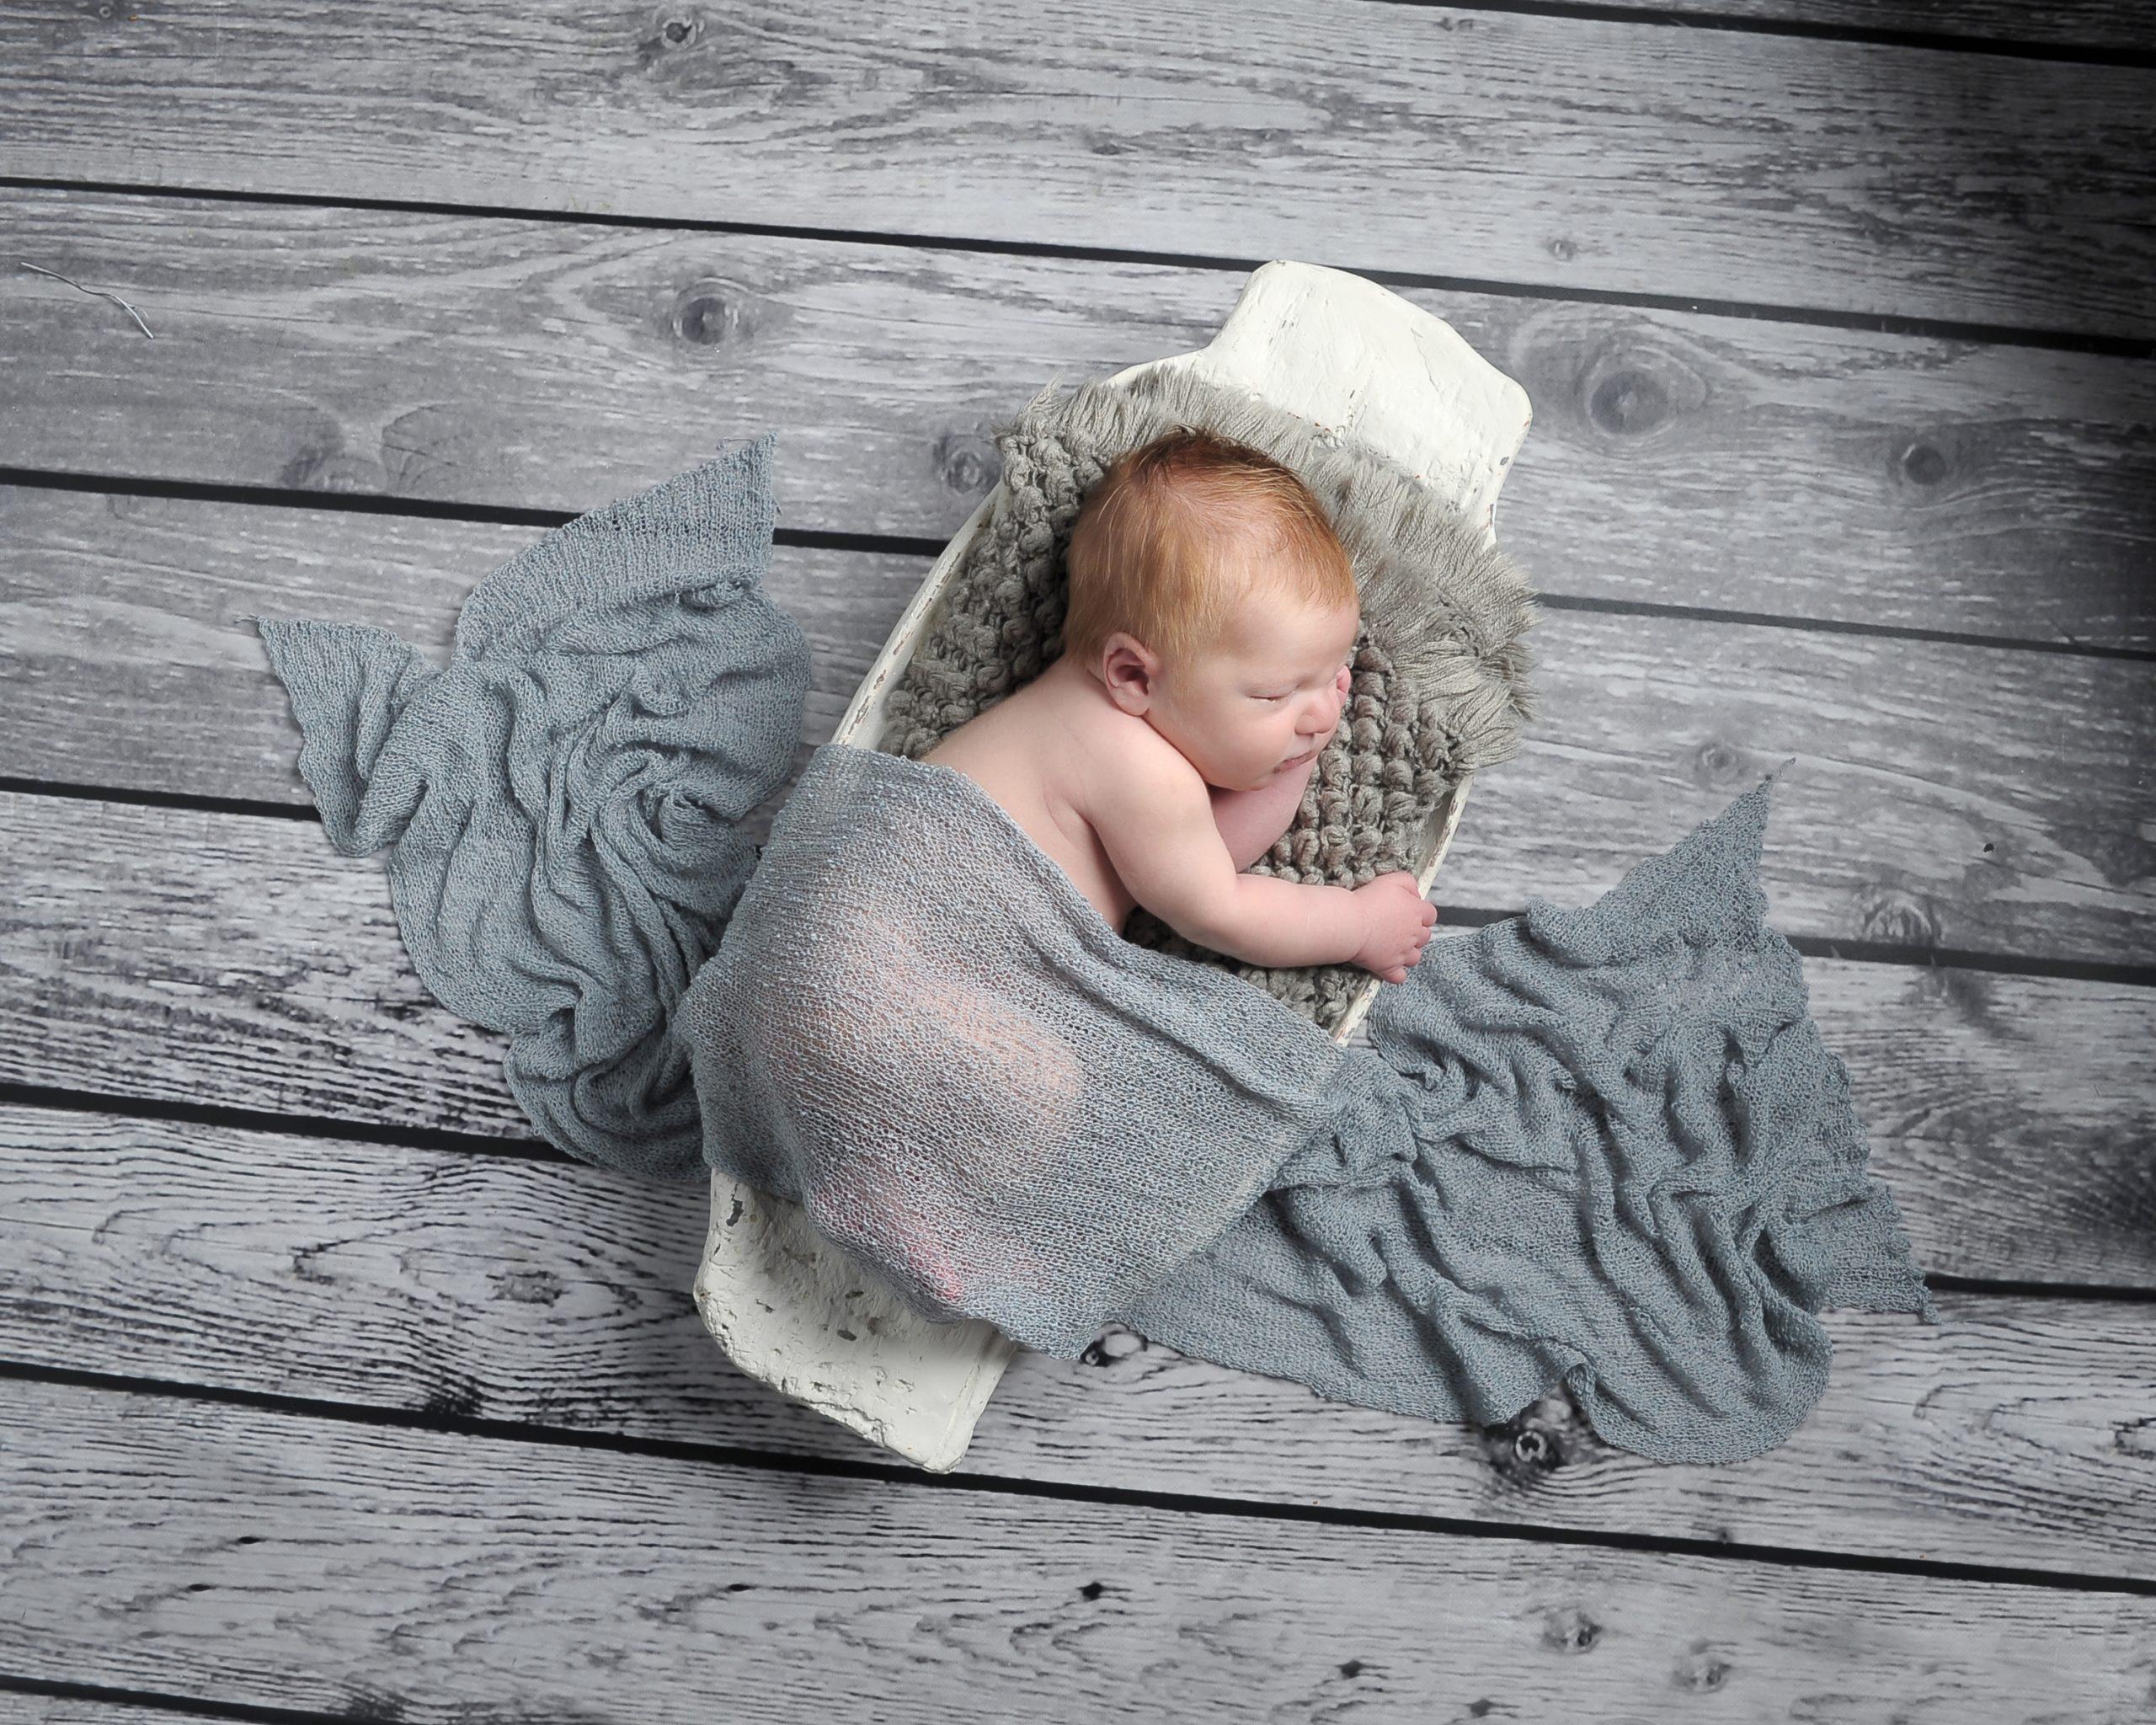 Newborn baby born sleeping in bowl